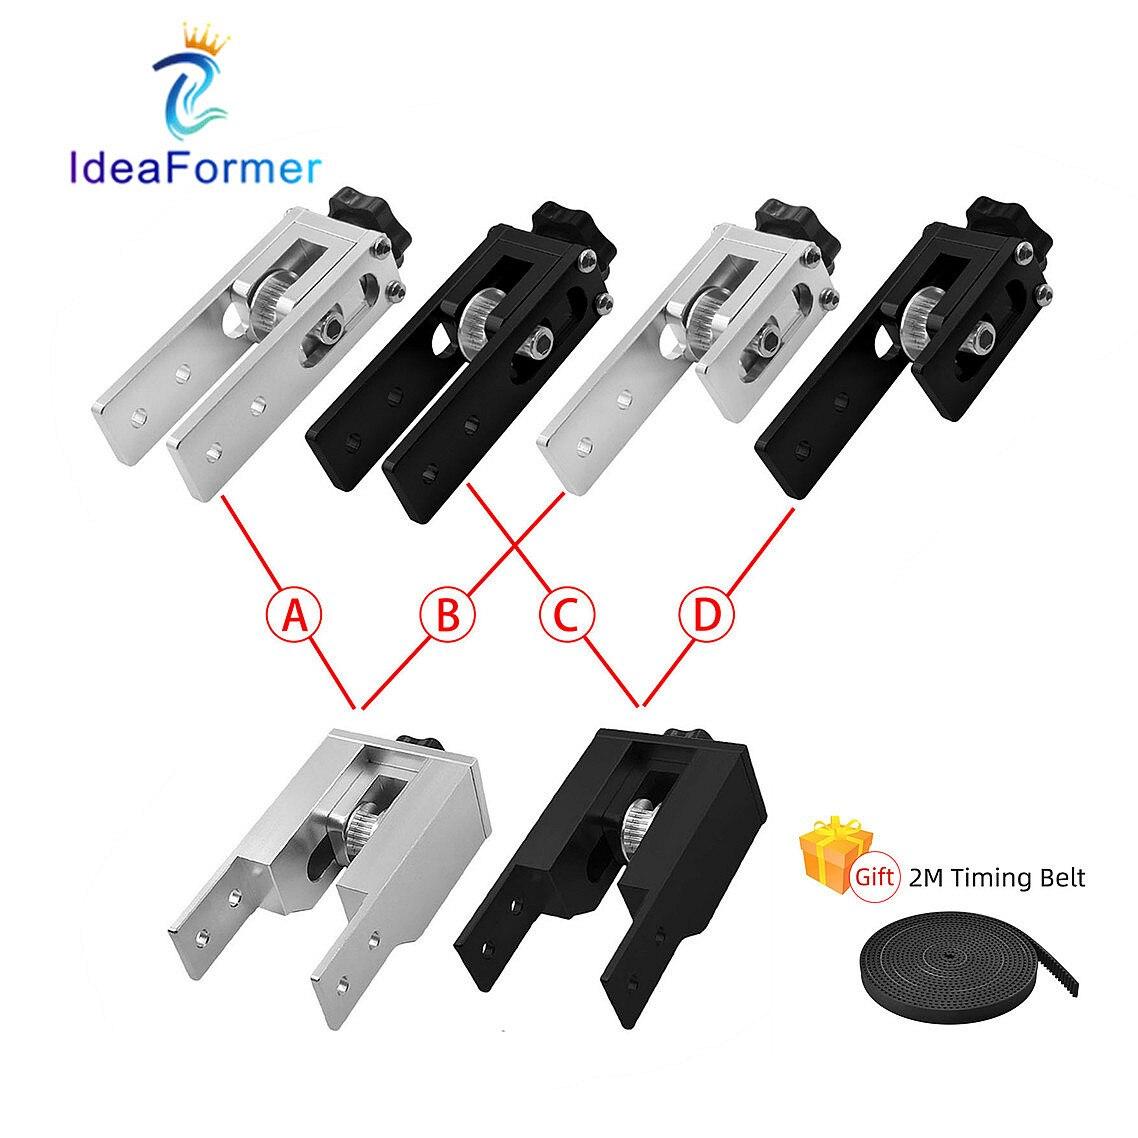 2020 & 2040 Timing Belt Stretch Tensioner Combination Set For V Slot Aluminum Profile Anet Creality Ender-3 CNC 3D Printer Parts